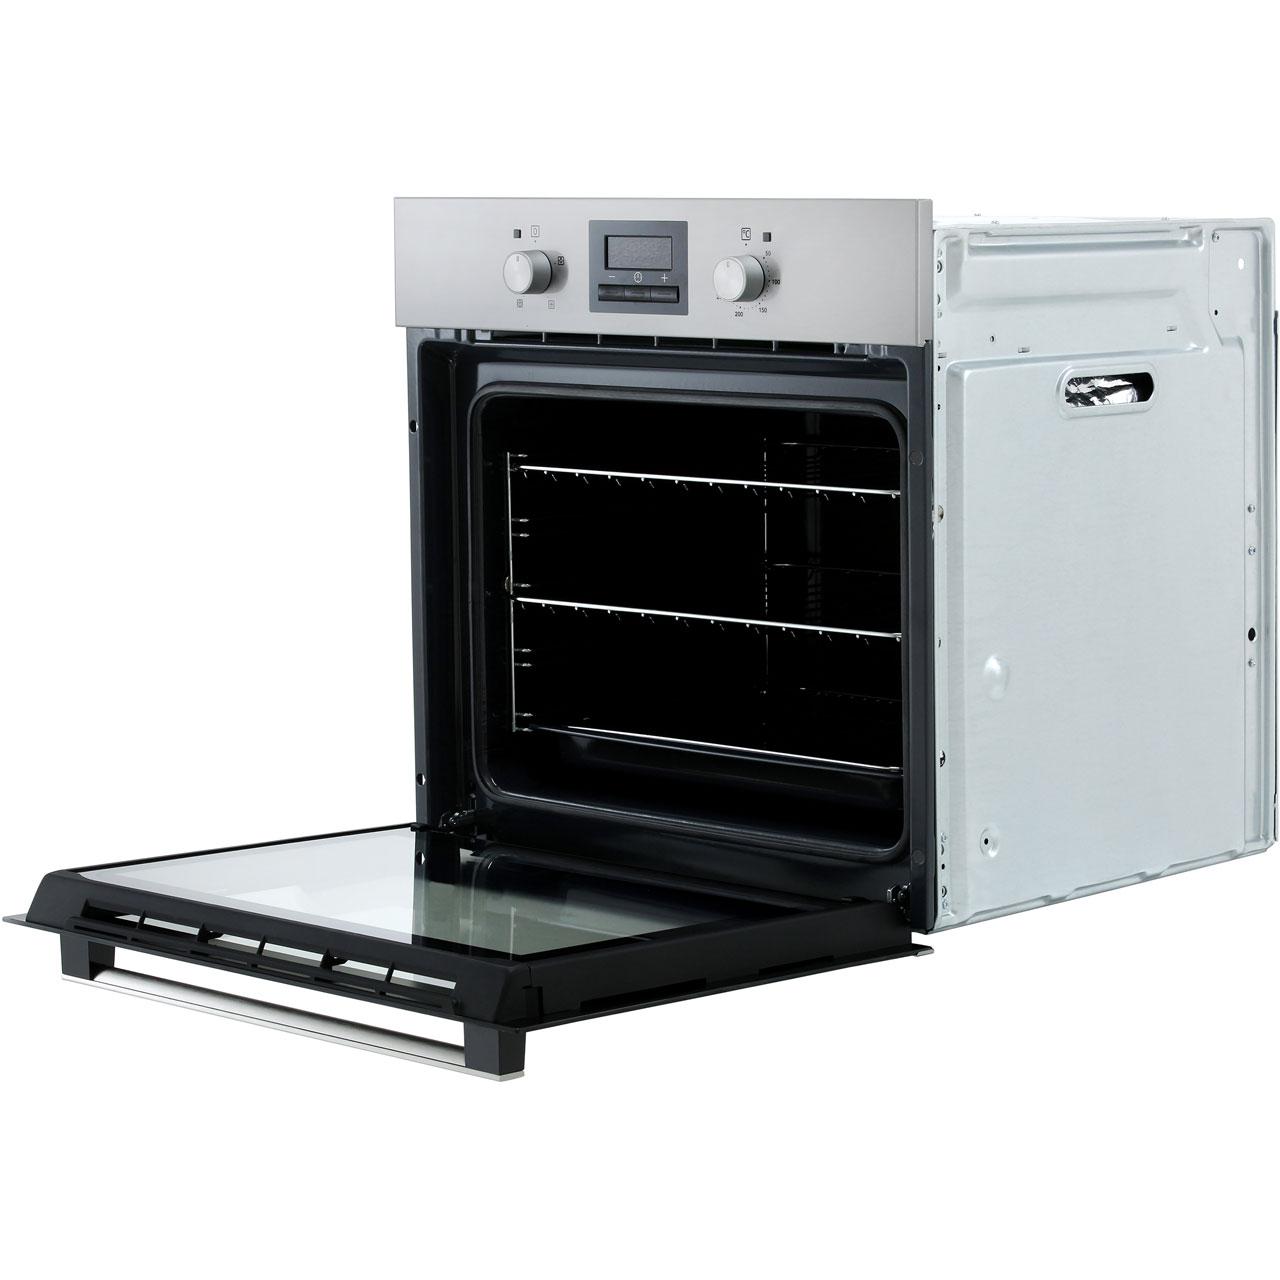 Zanussi Zoa35471xk Built In 59cm A Electric Single Oven